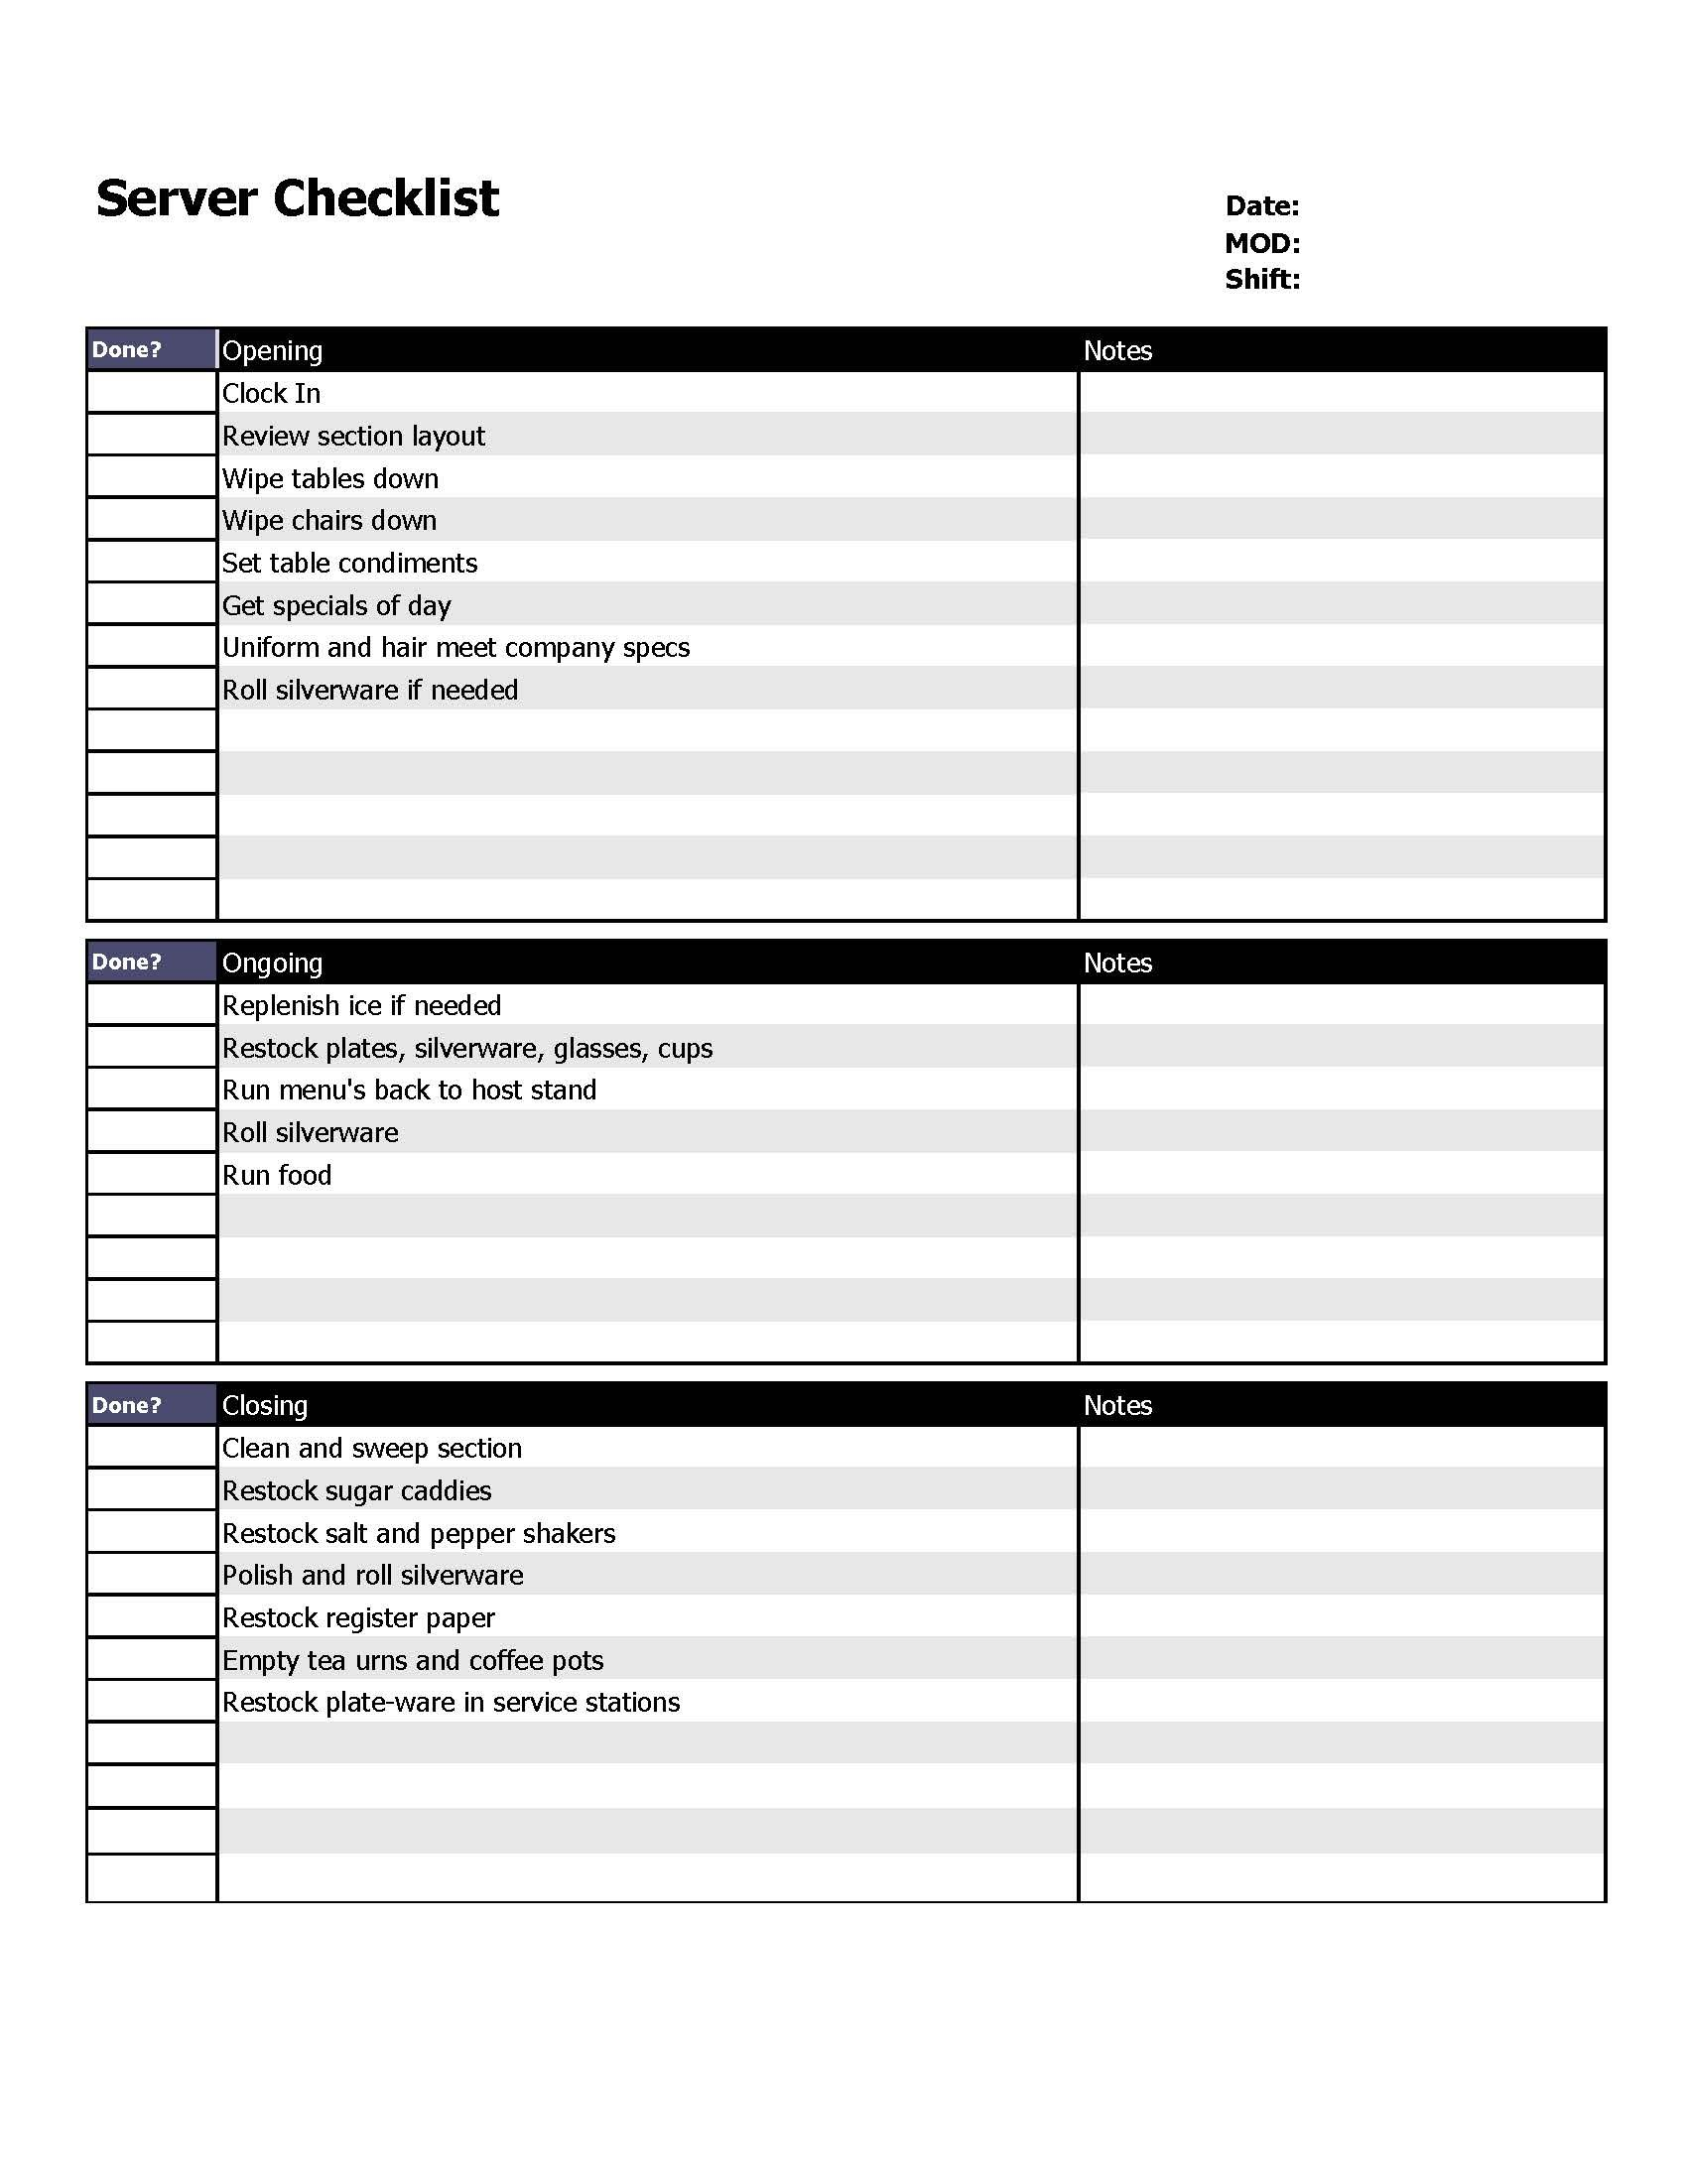 Restaurant server checklist form. Organizing Pinterest